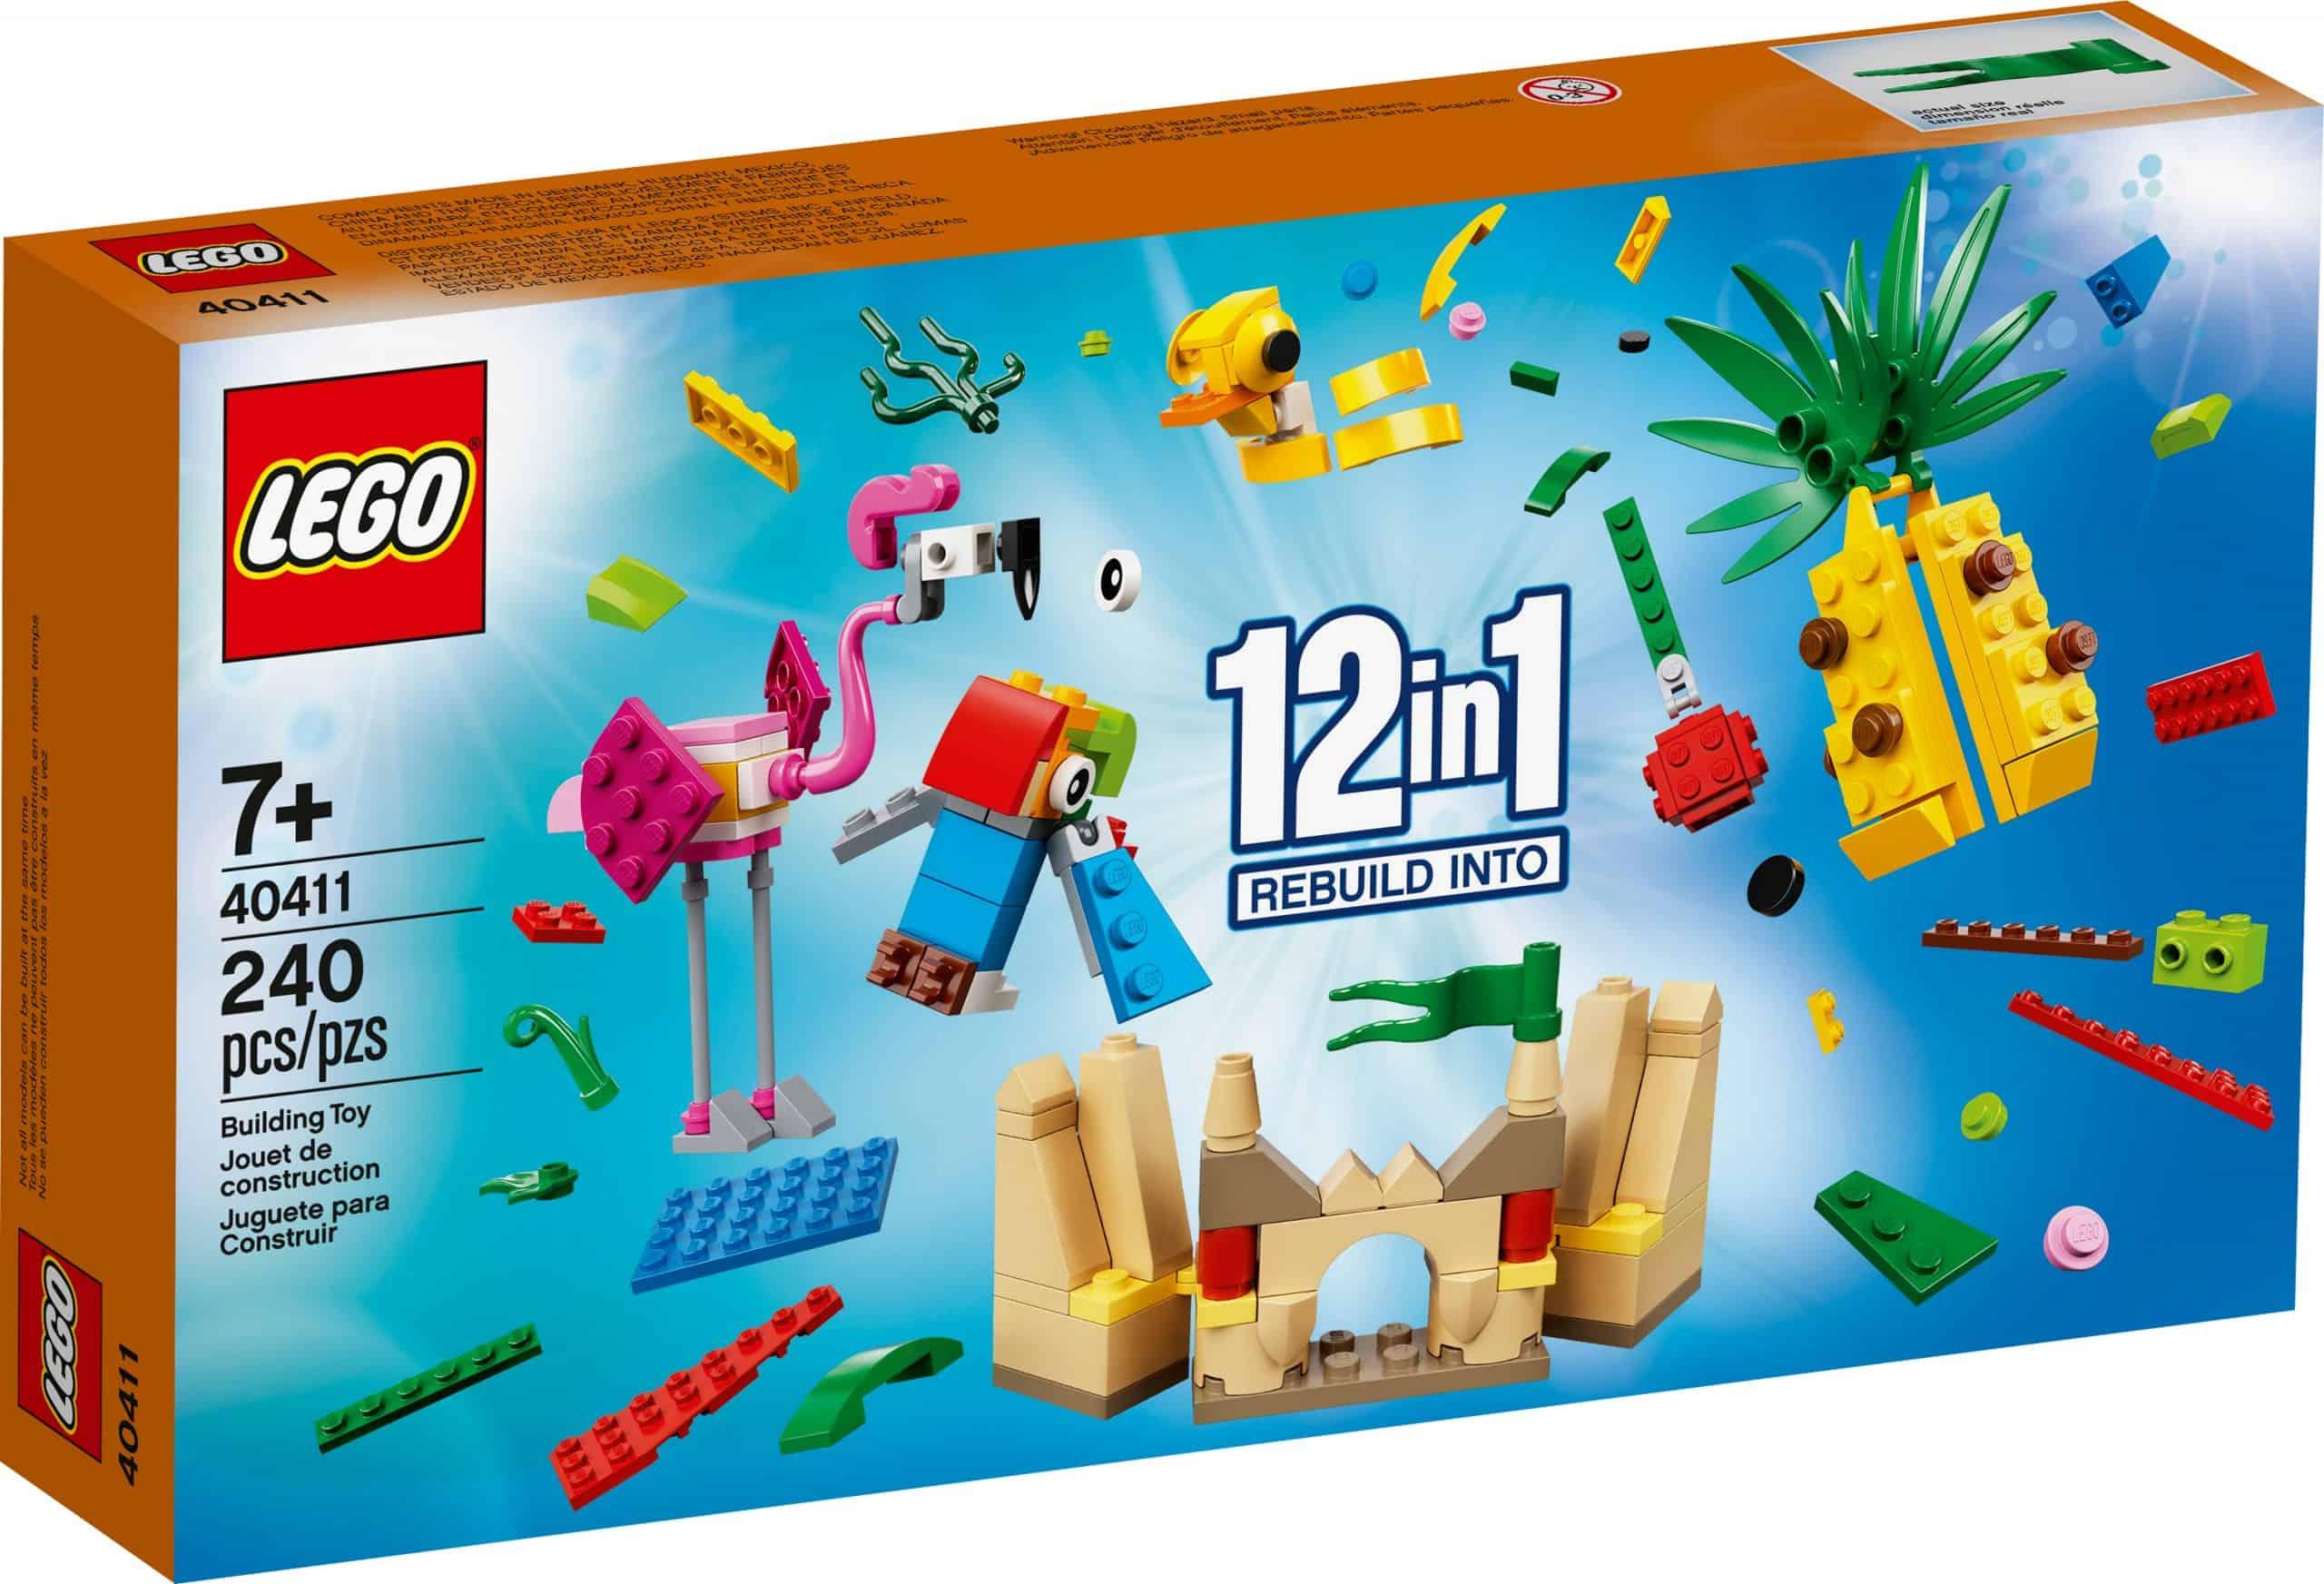 lego creatief plezier 12 in 1 40411 scaled